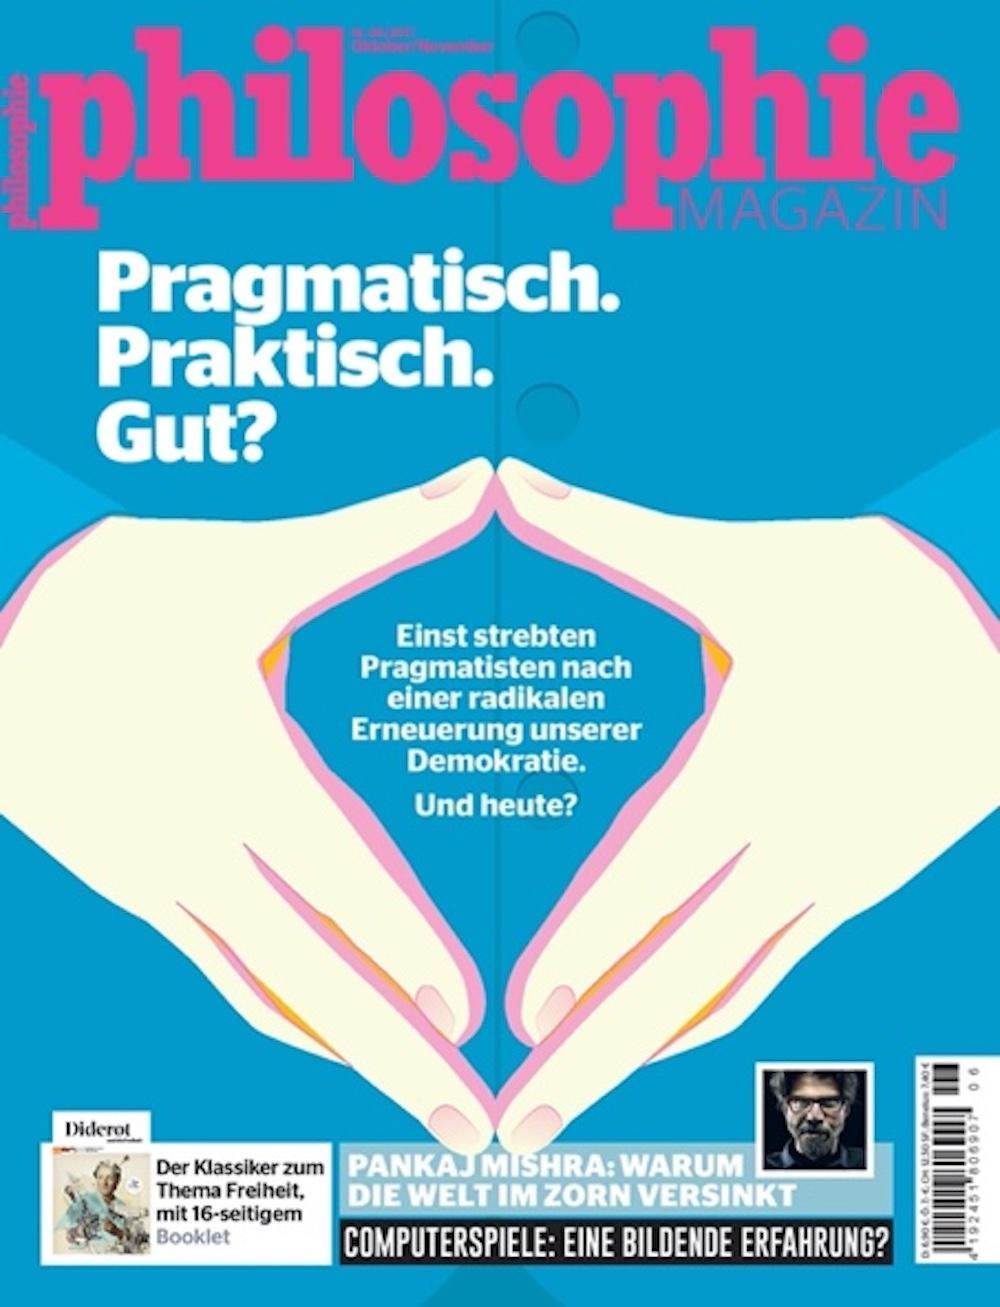 Philosophie Magazin 2017-10-11